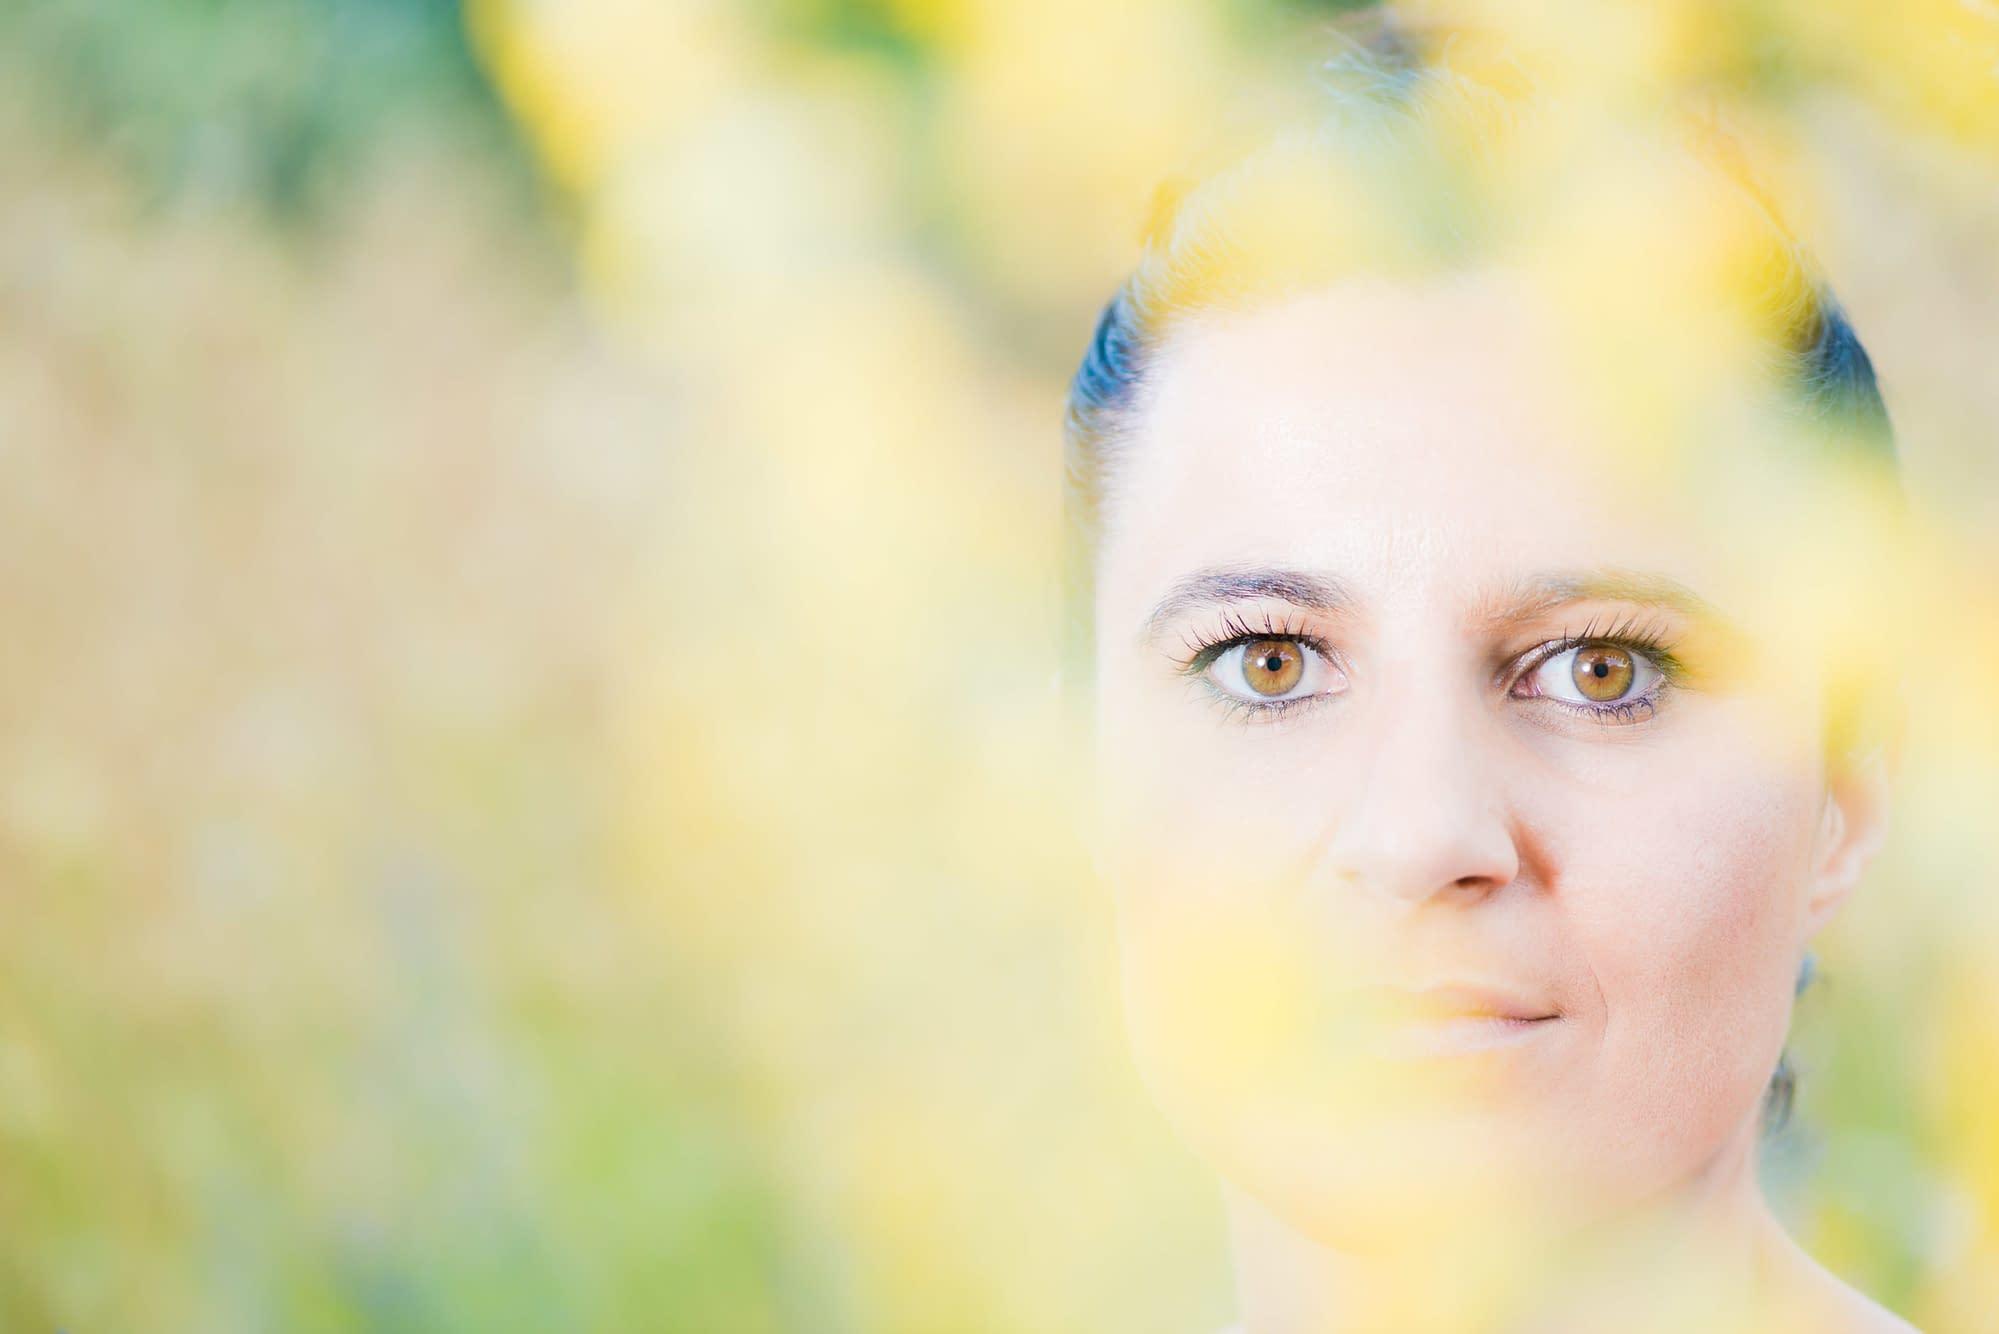 Lucille_Galleli-Portraiture_2018_1632